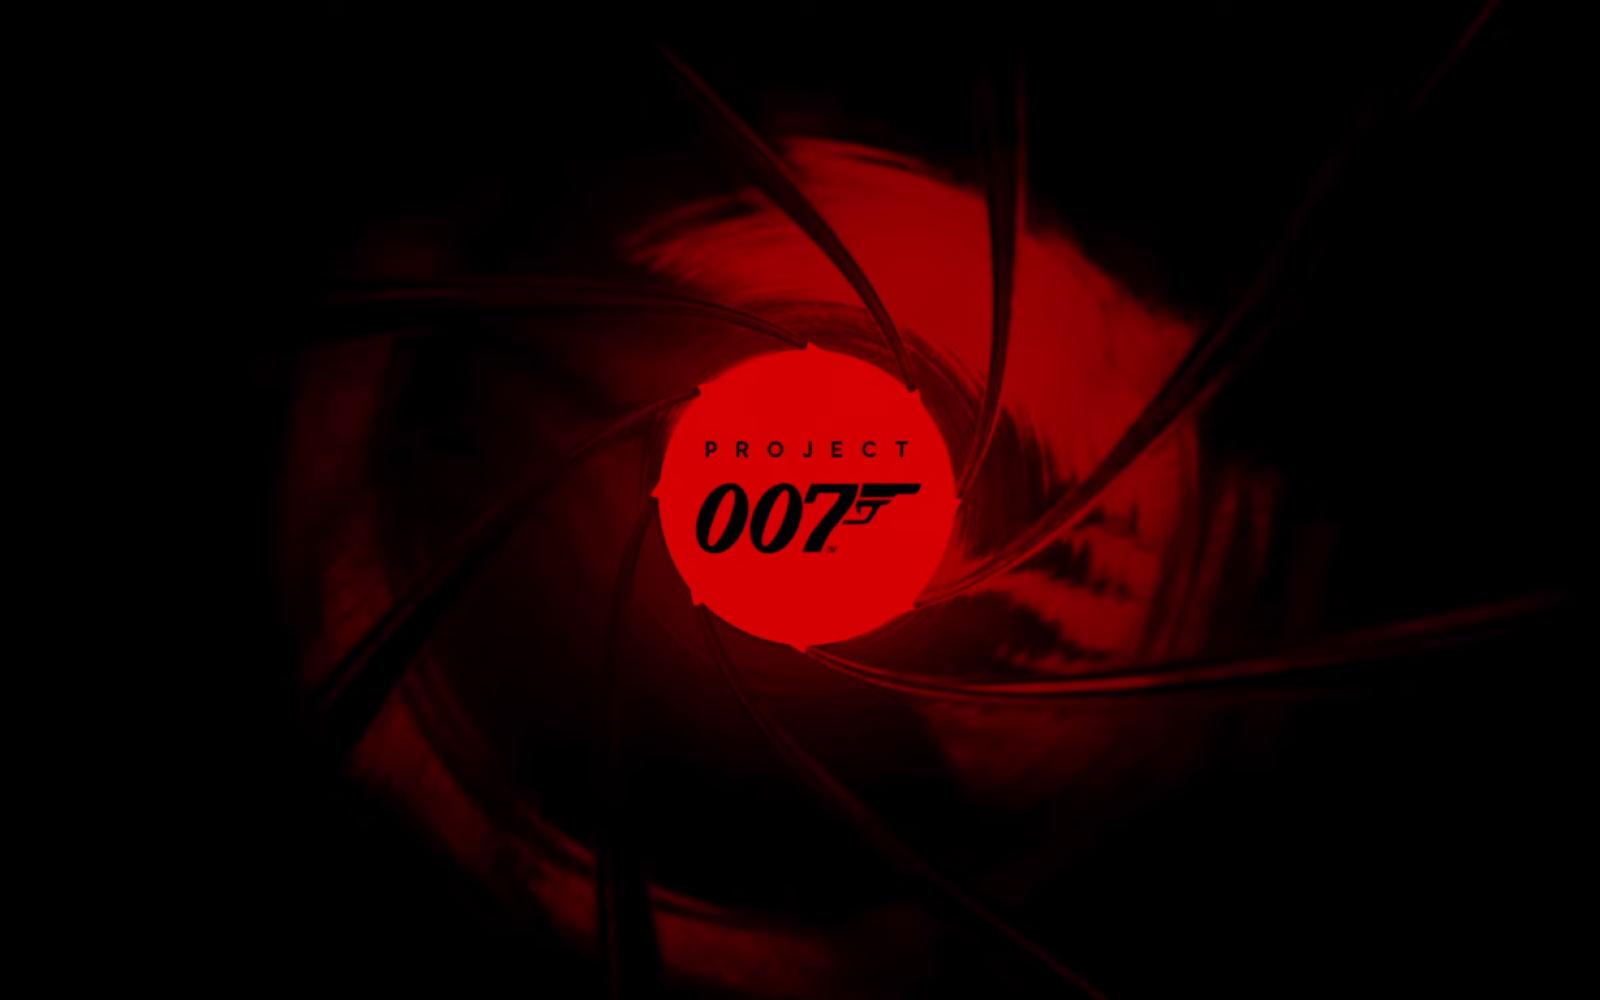 A New James Bond Game Is In Development By Hitman Developer – IO Interactive